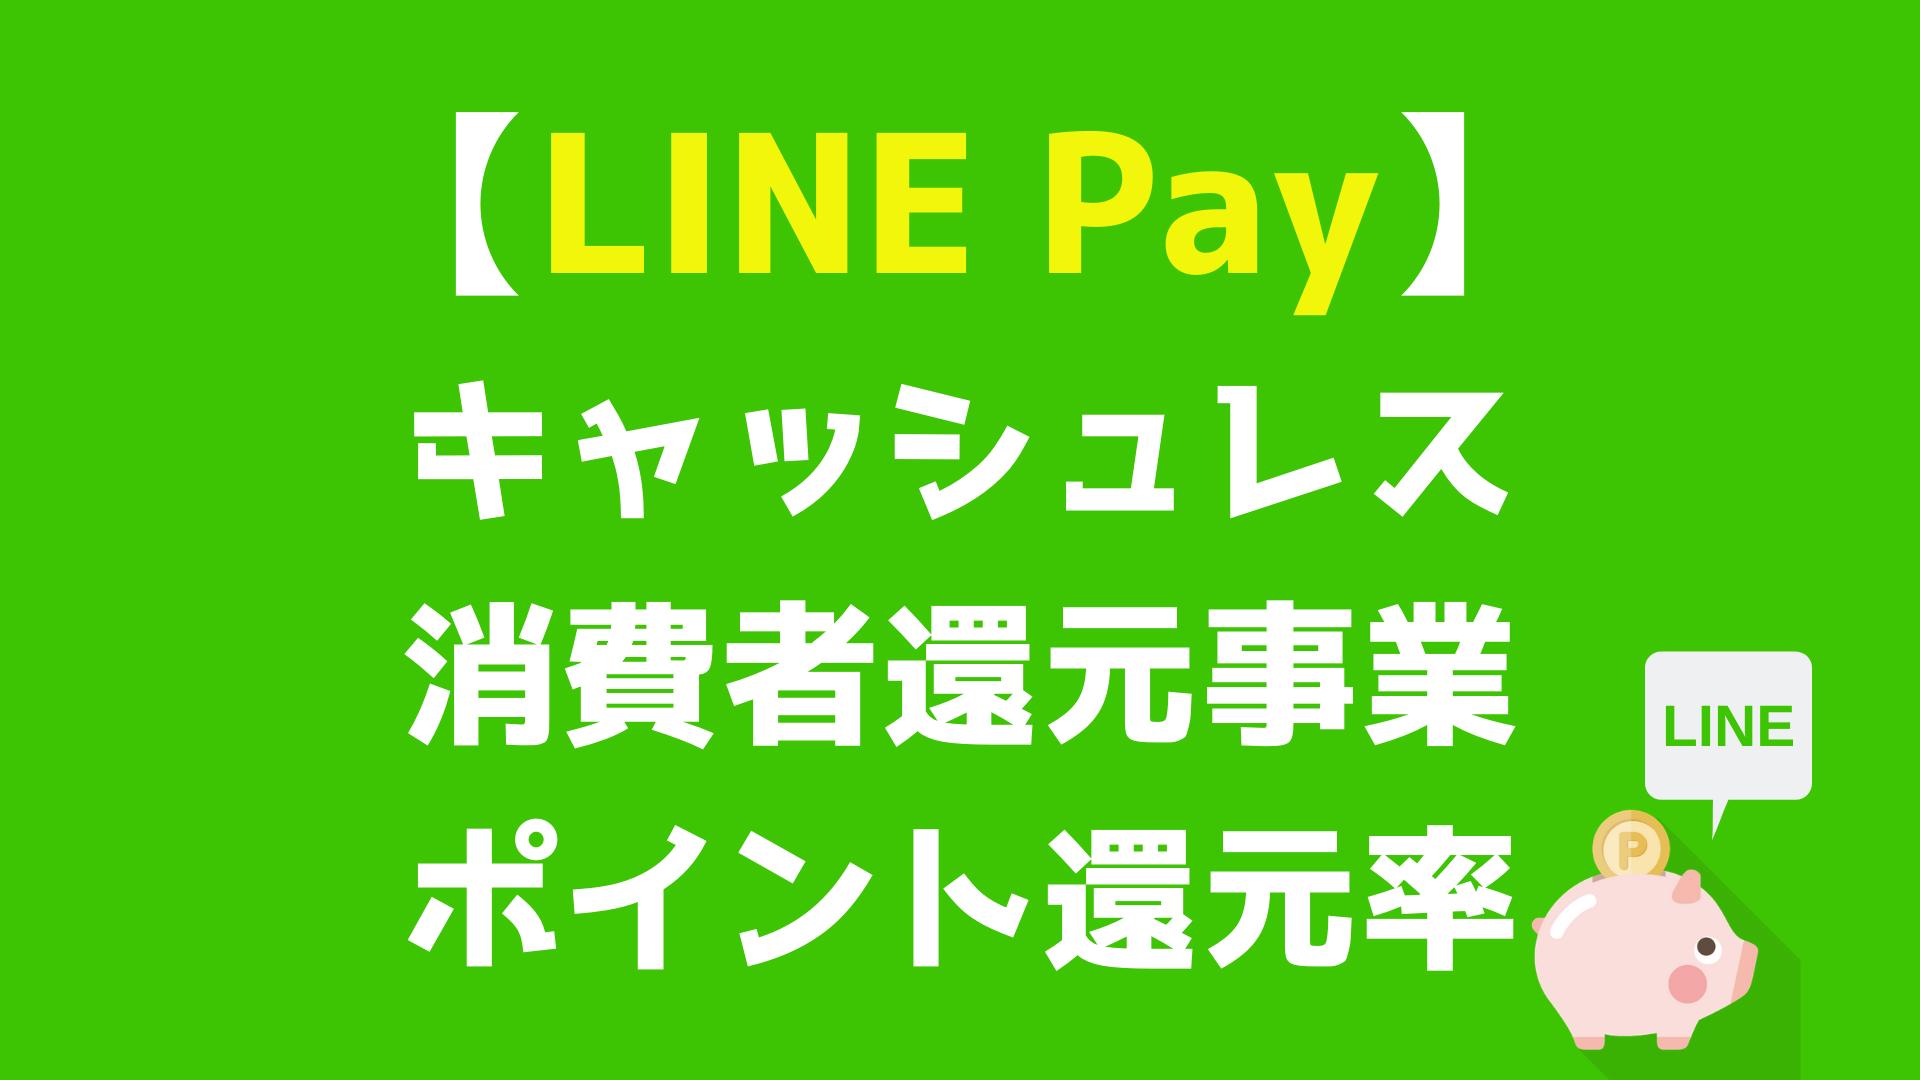 【LINEPay】キャッシュレス・消費者還元事業 ポイント還元率